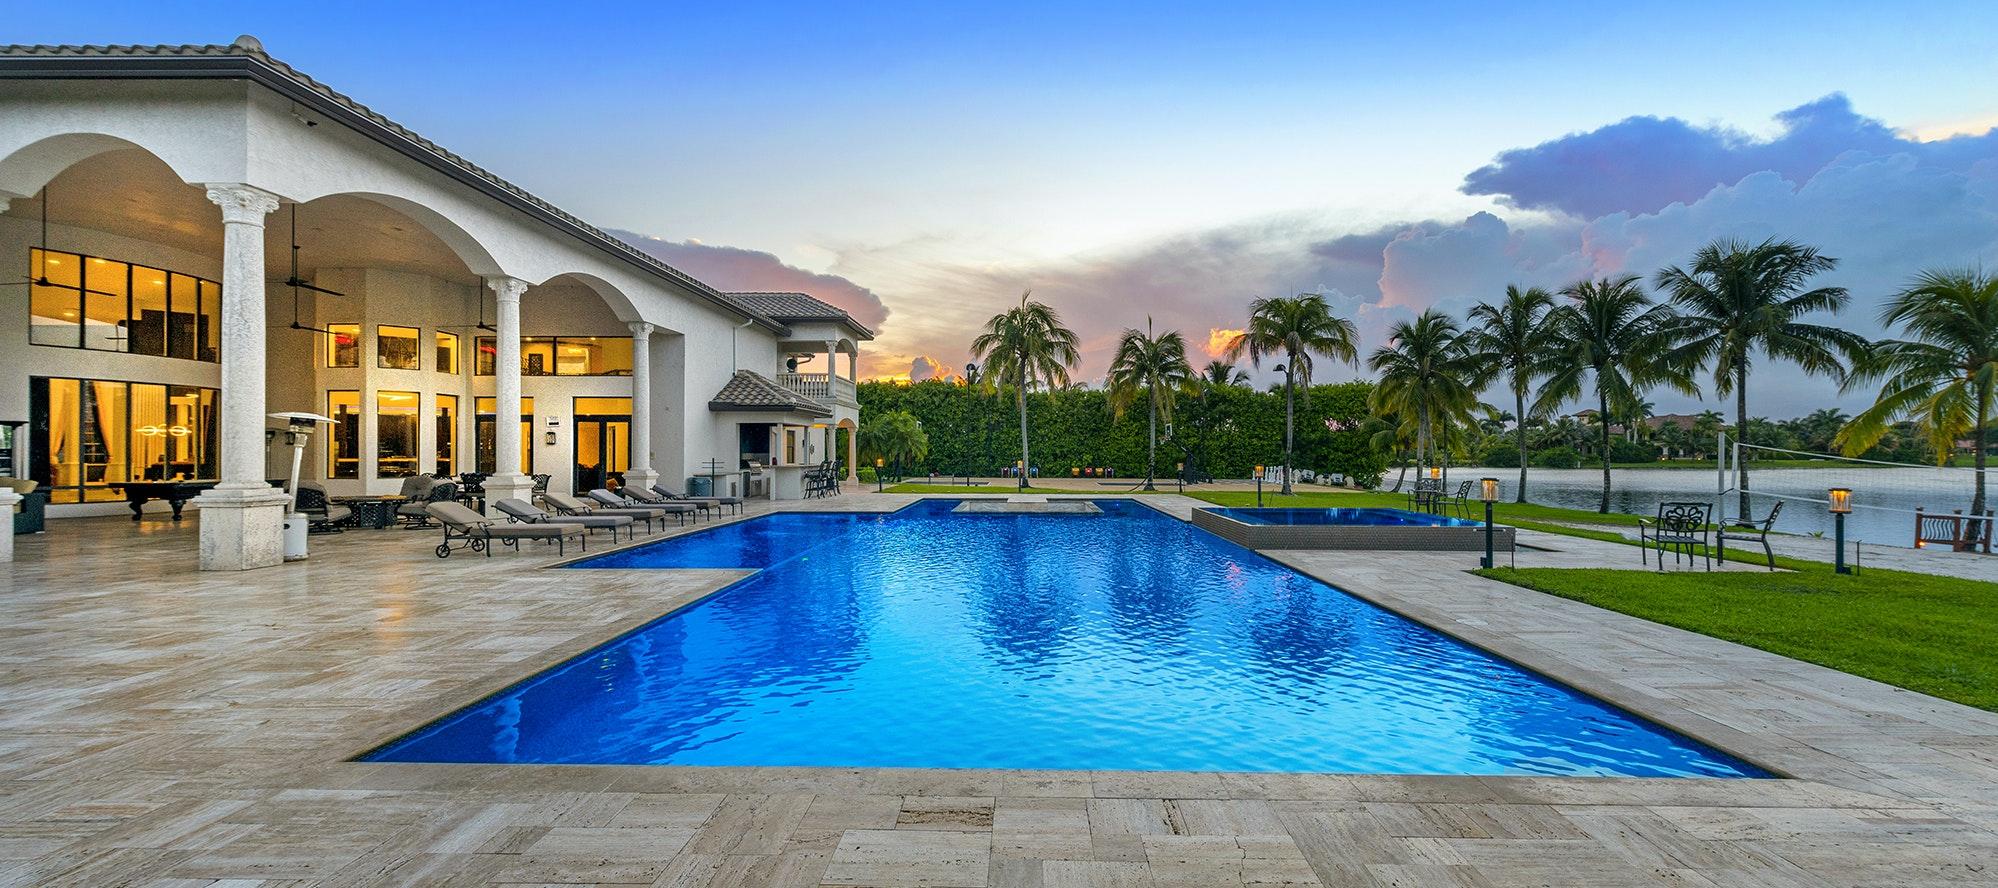 Villa Lake luxury rental in Hollywood